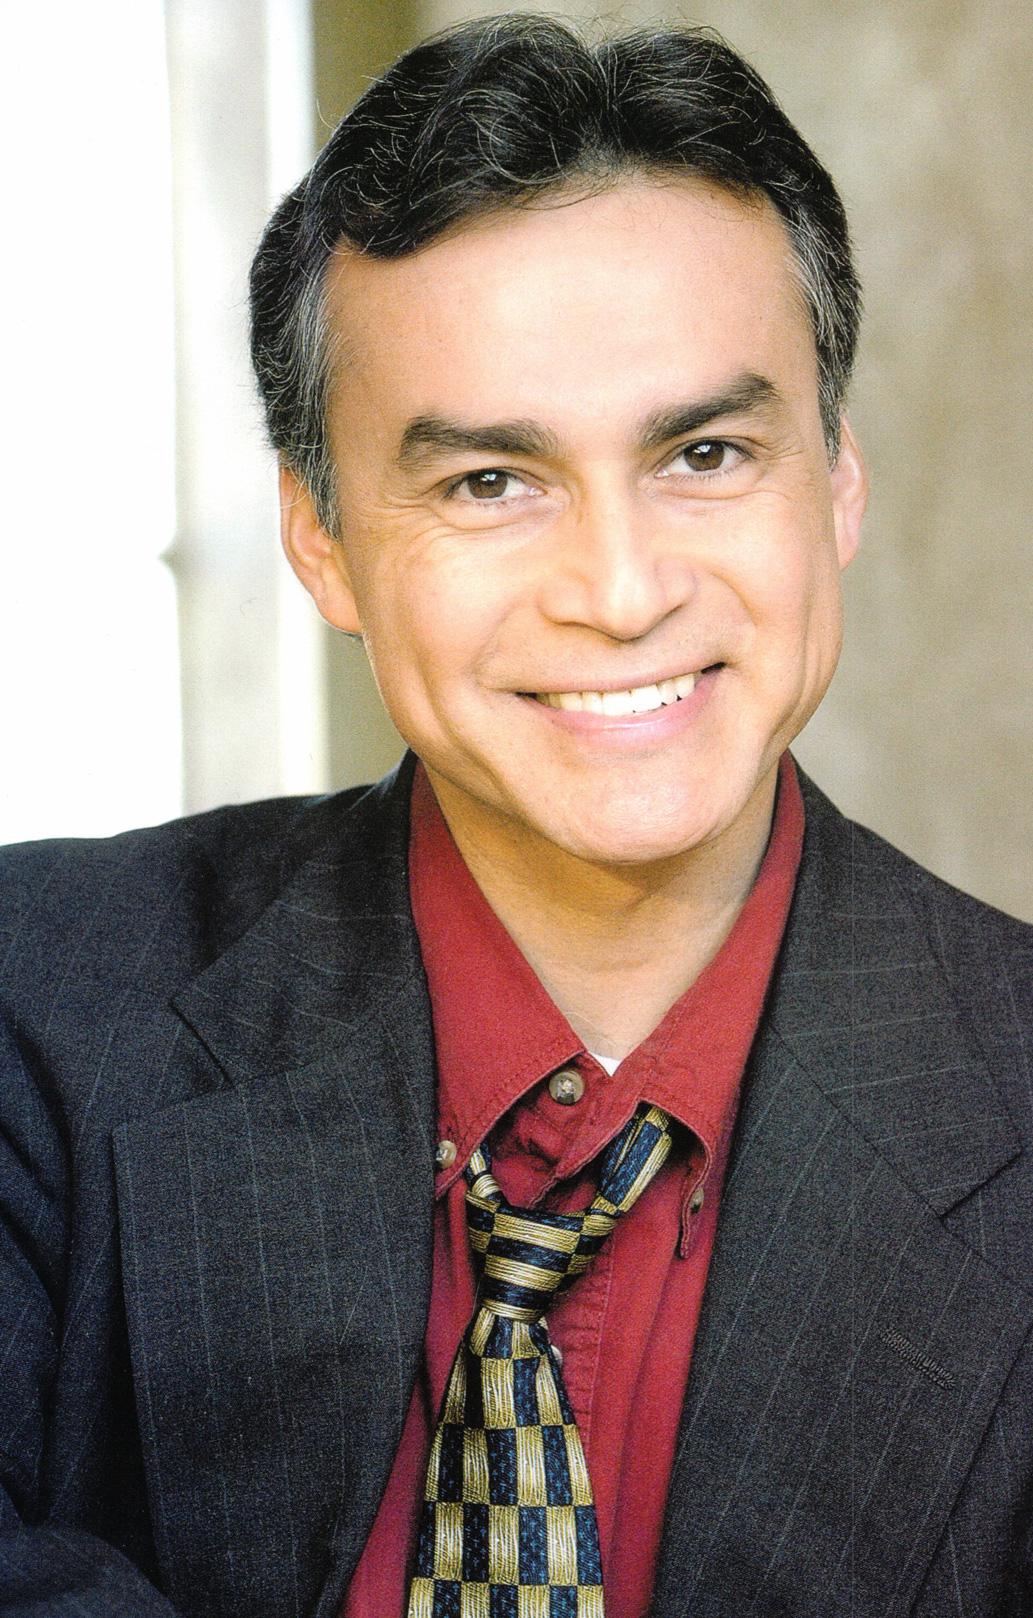 David michael treviño